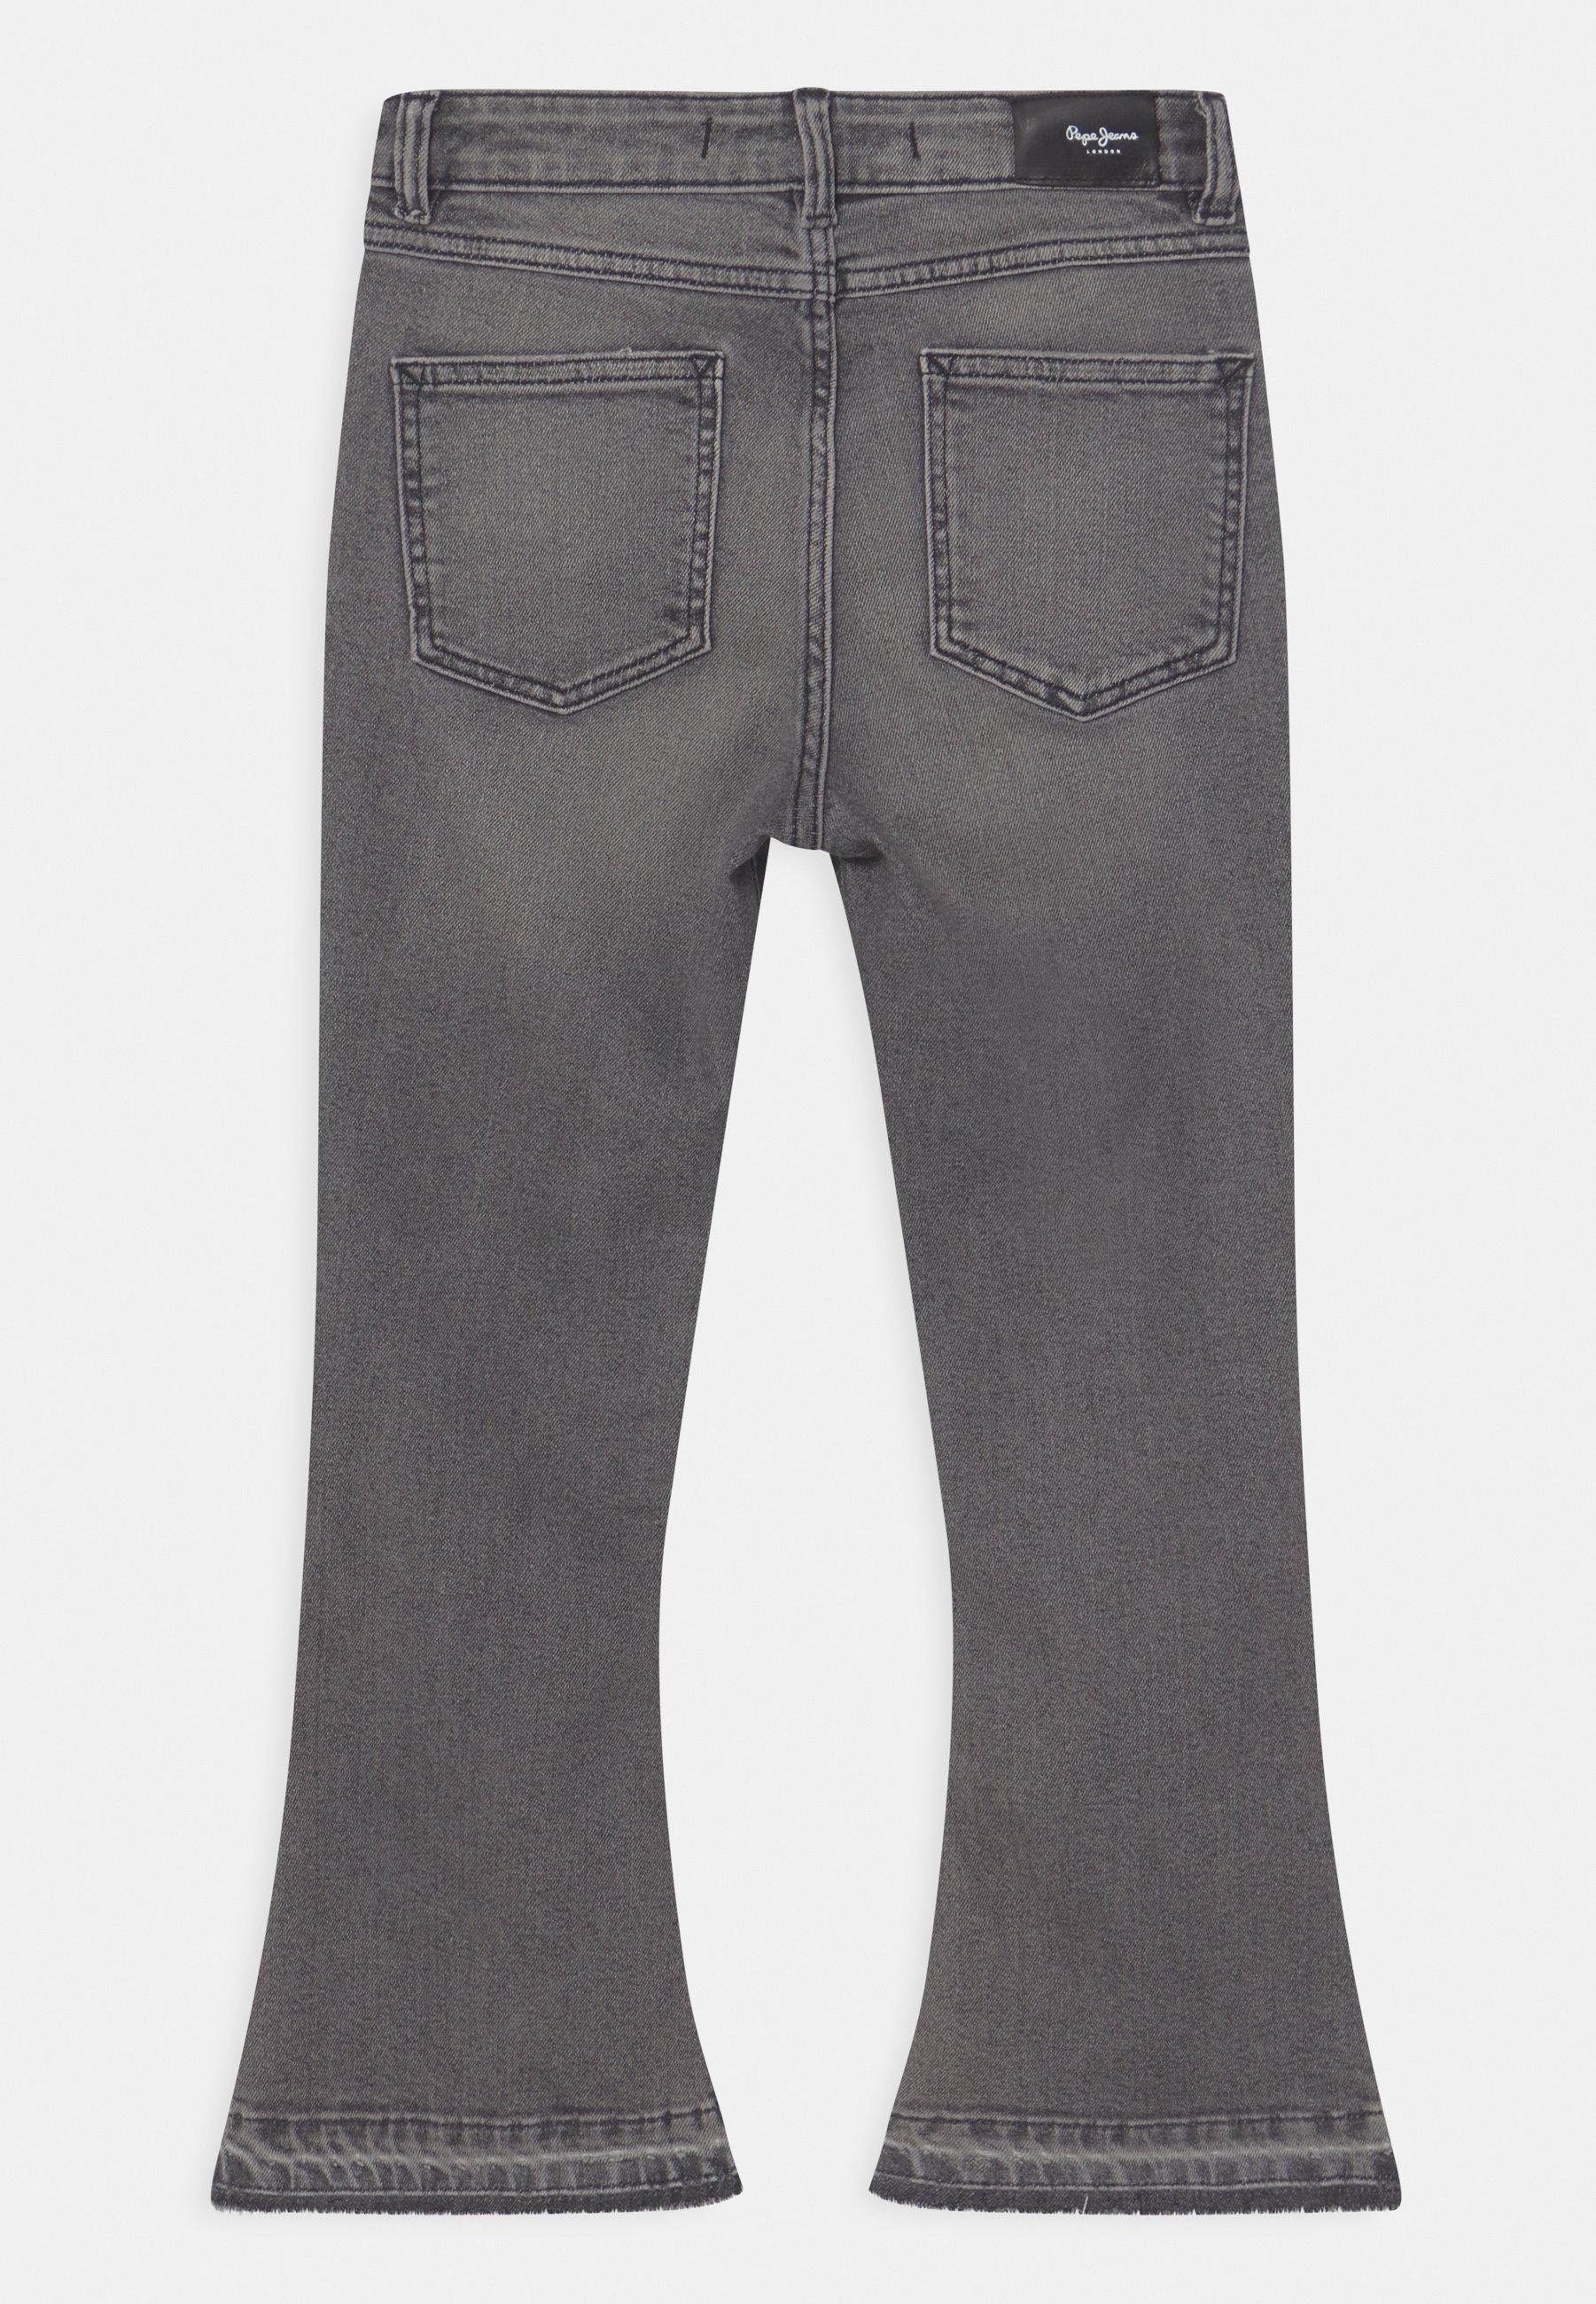 Enfant KIMBERLY FLARE - Jean bootcut